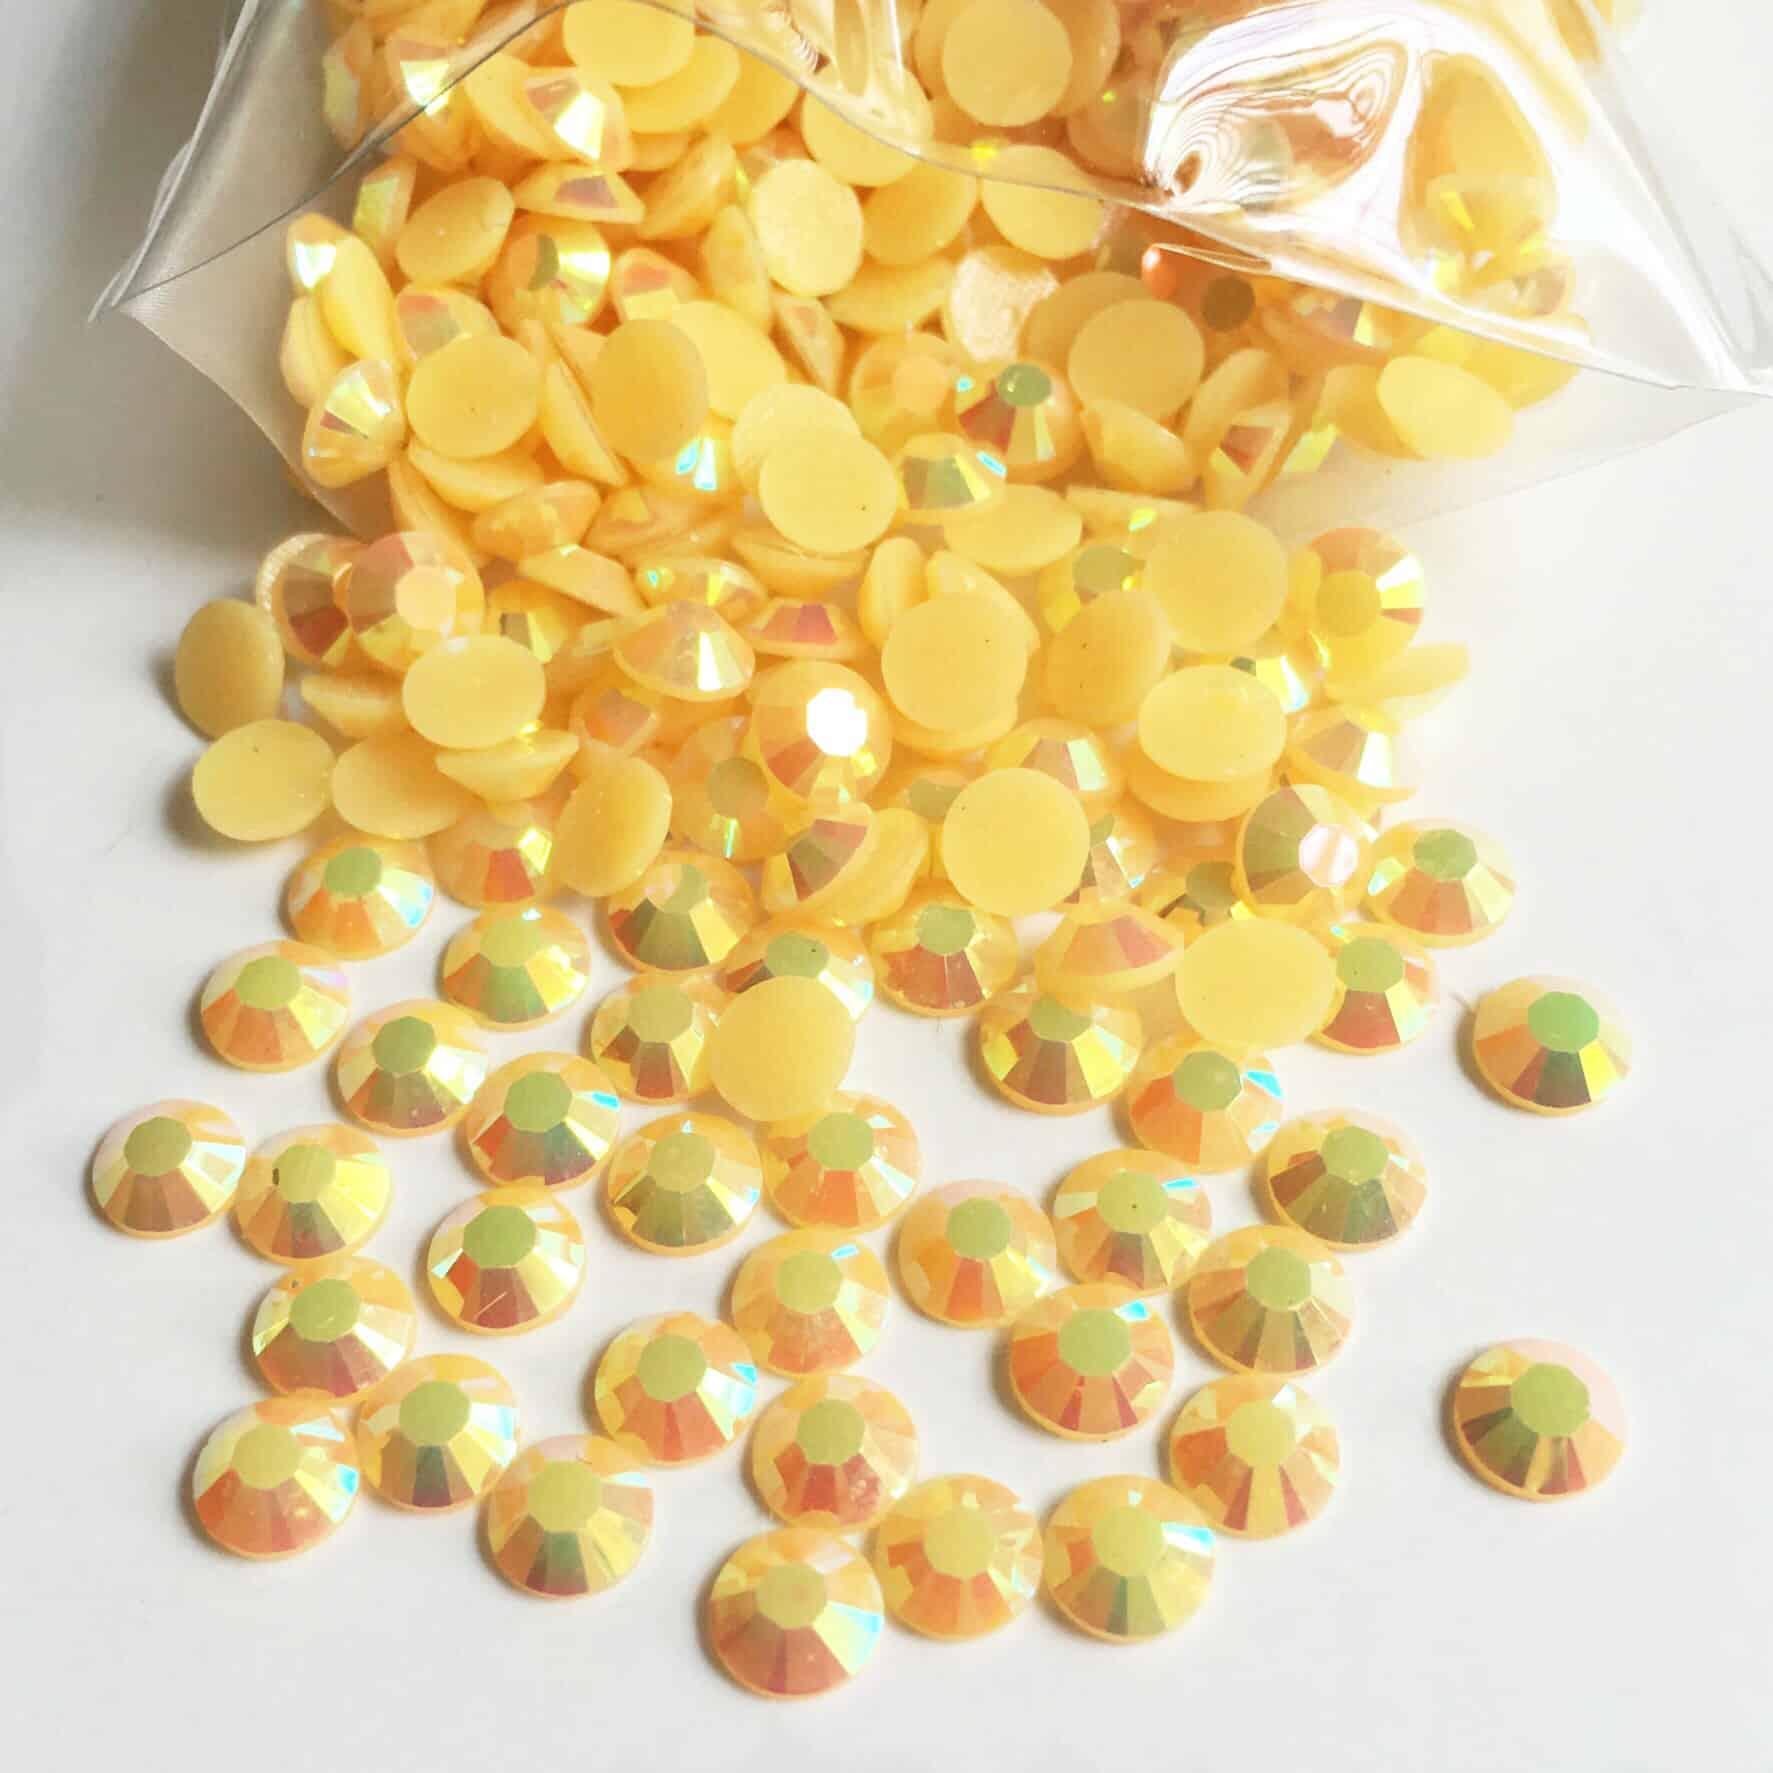 Acrylic Flatback Gem Stones (YELLOW AB) SS30 (PACK OF 1000)